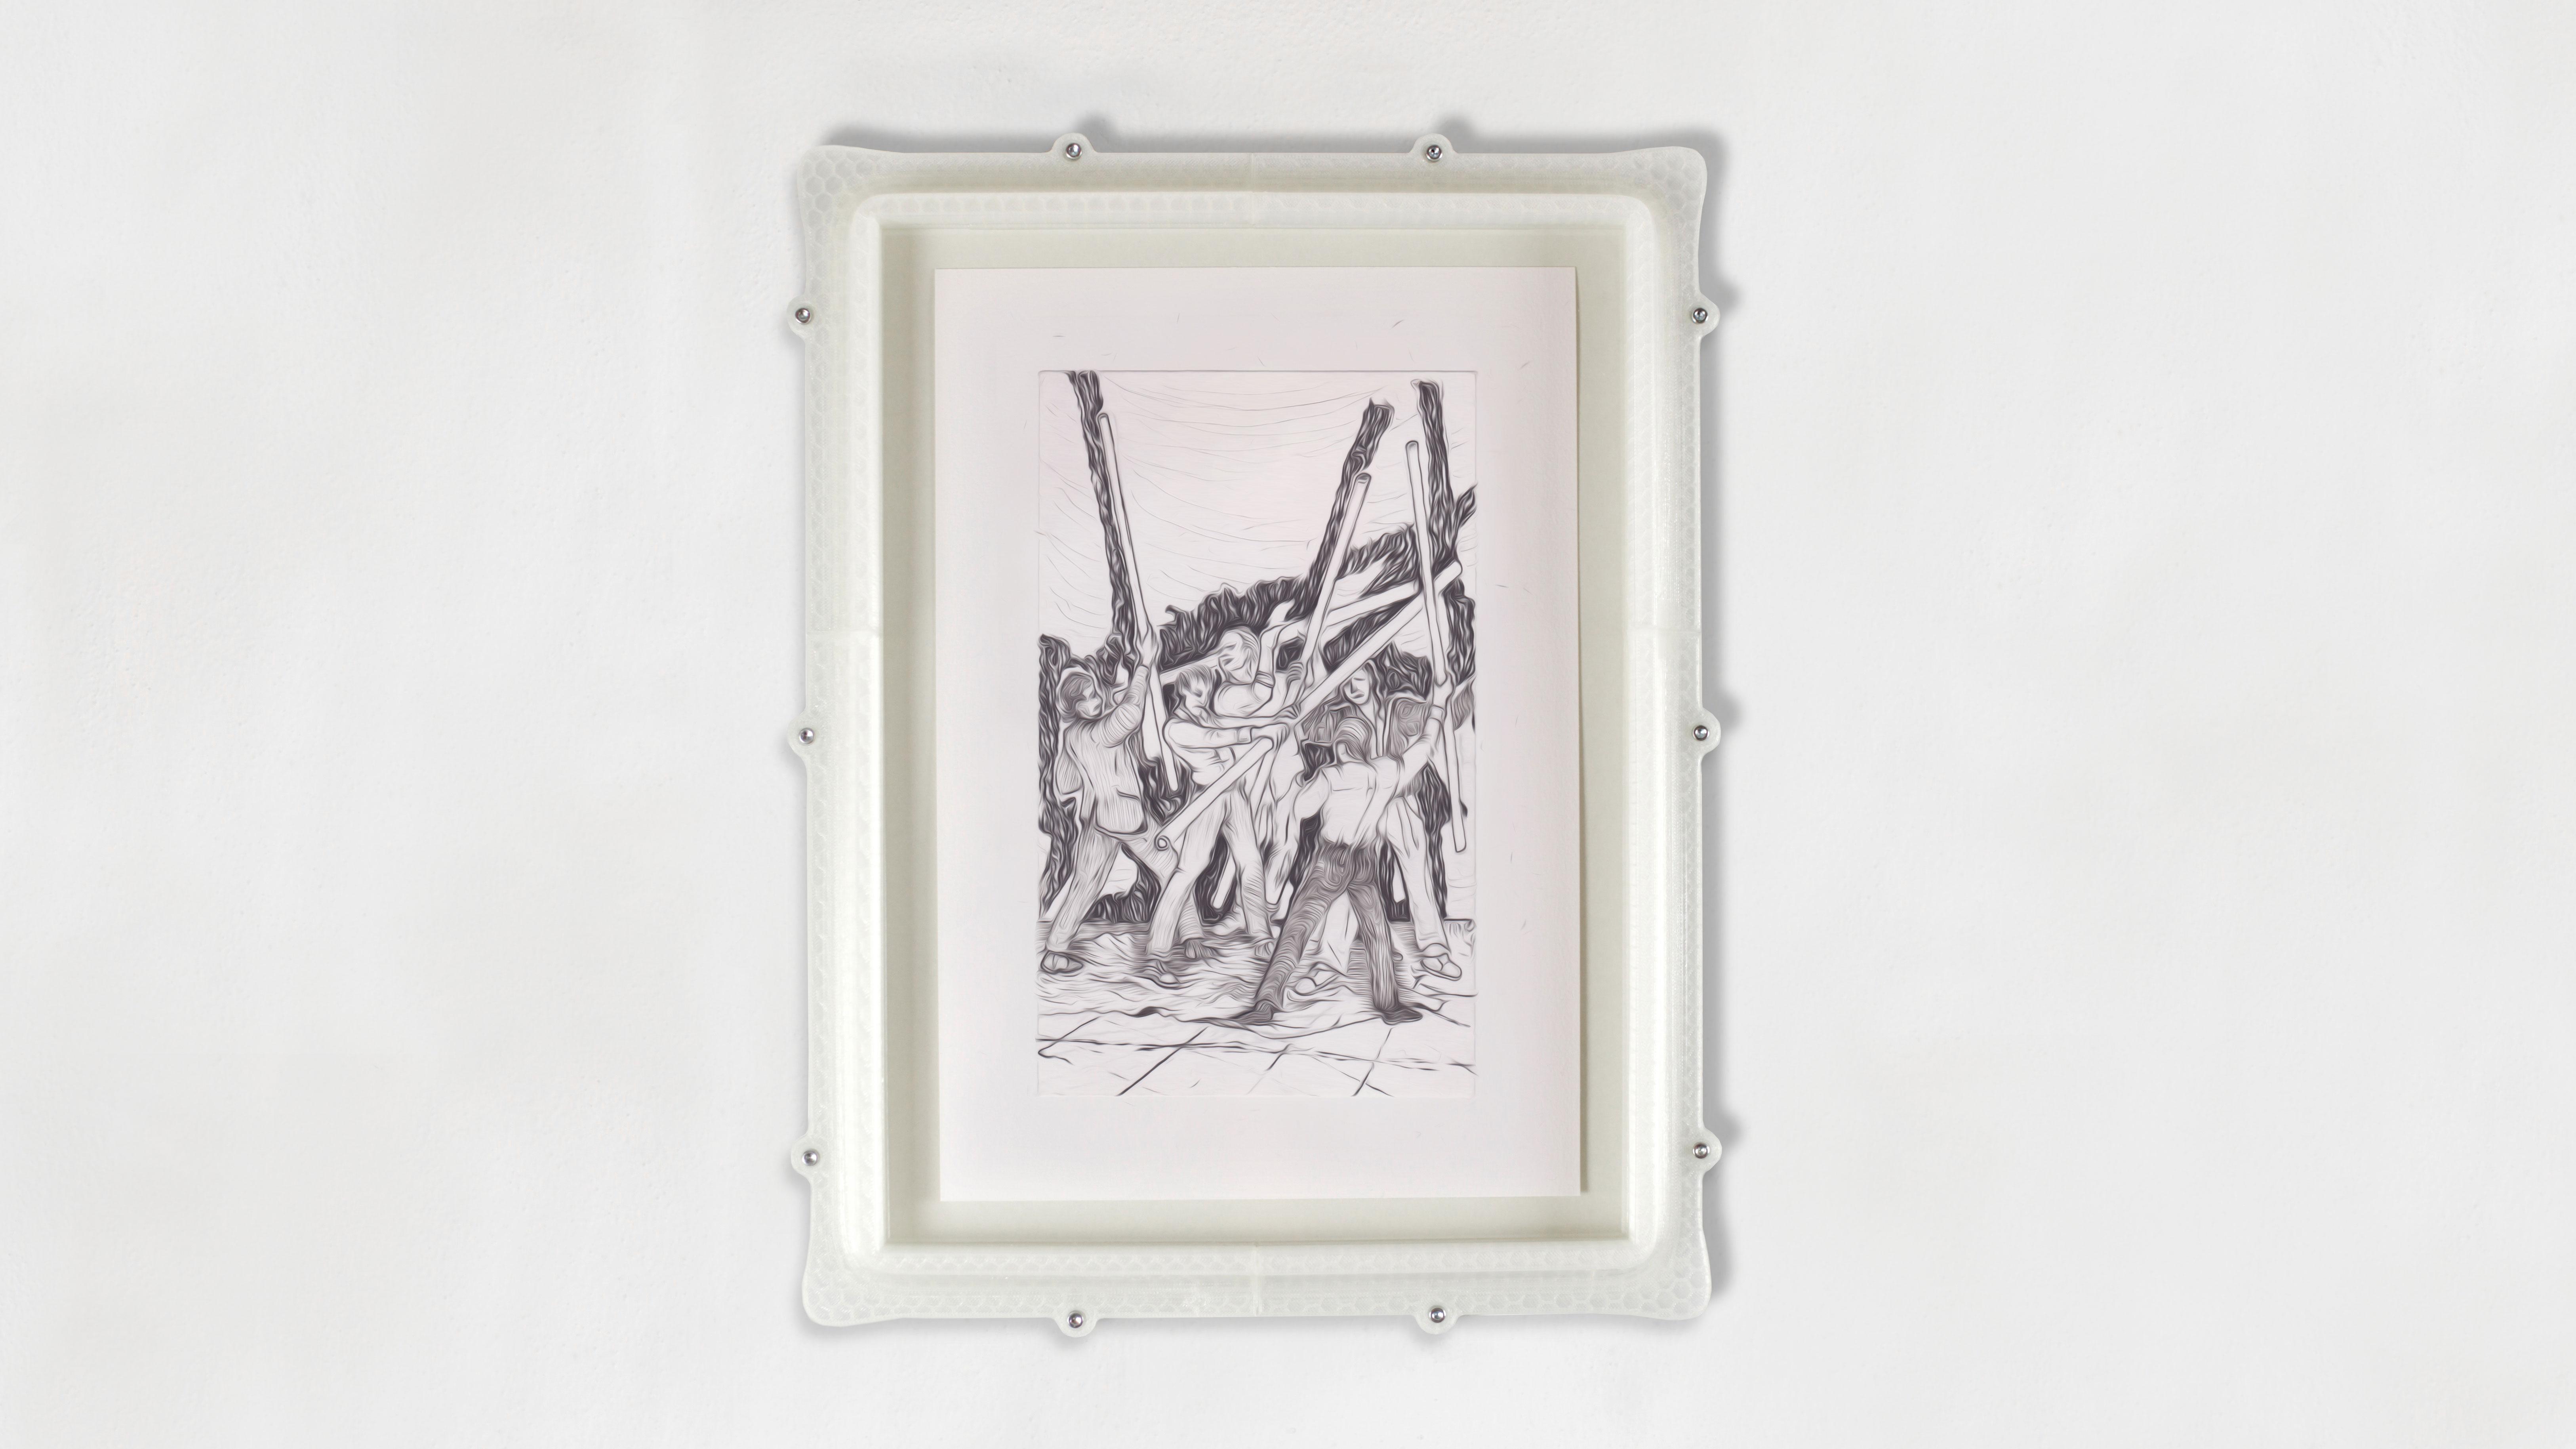 Paul Valentin Art Image